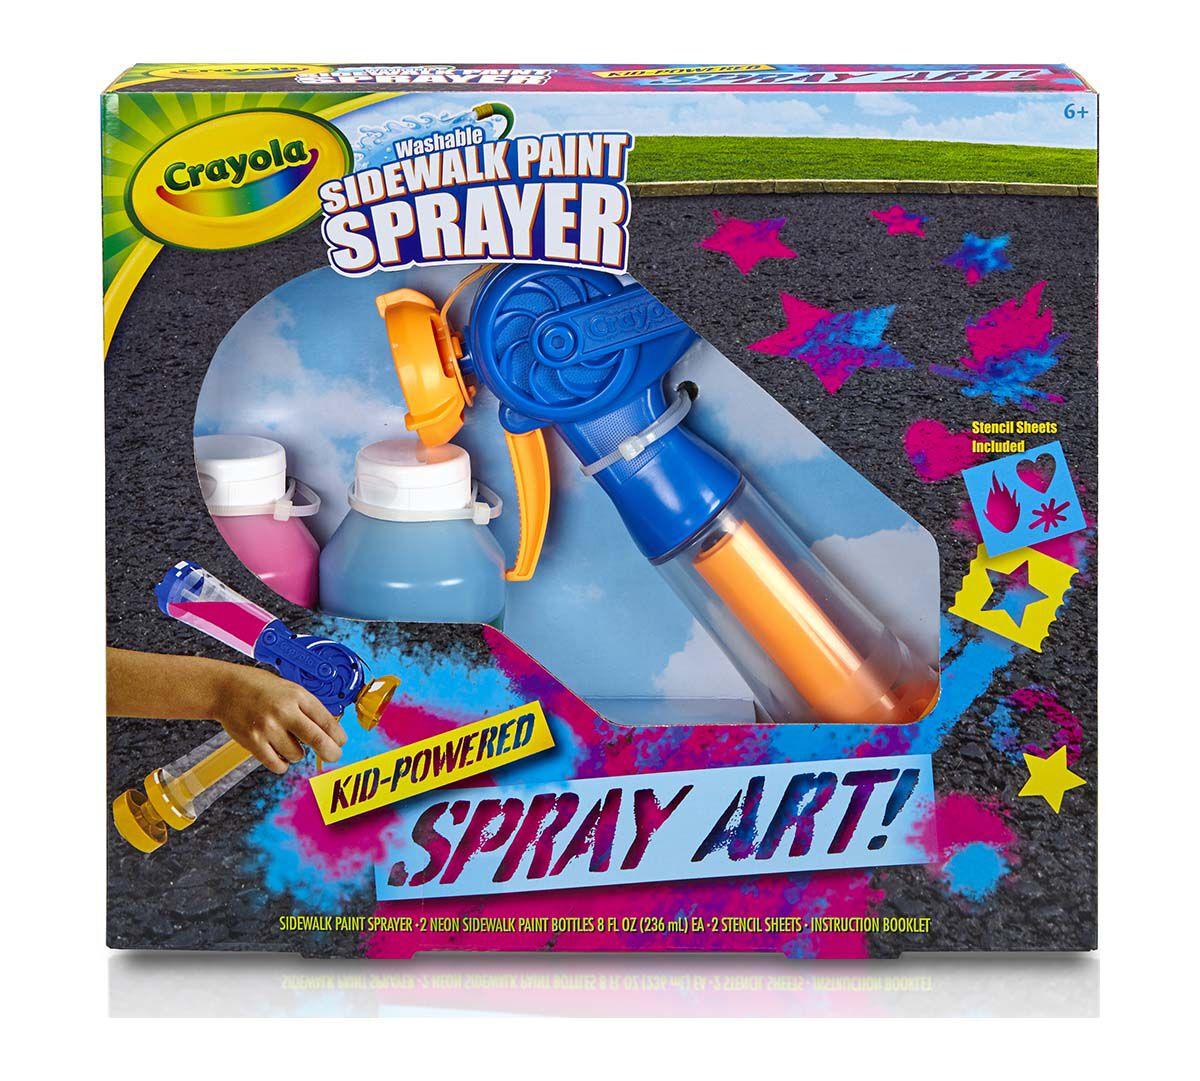 Crayola Washable Sidewalk Paint Sprayer Outdoor All Seasons